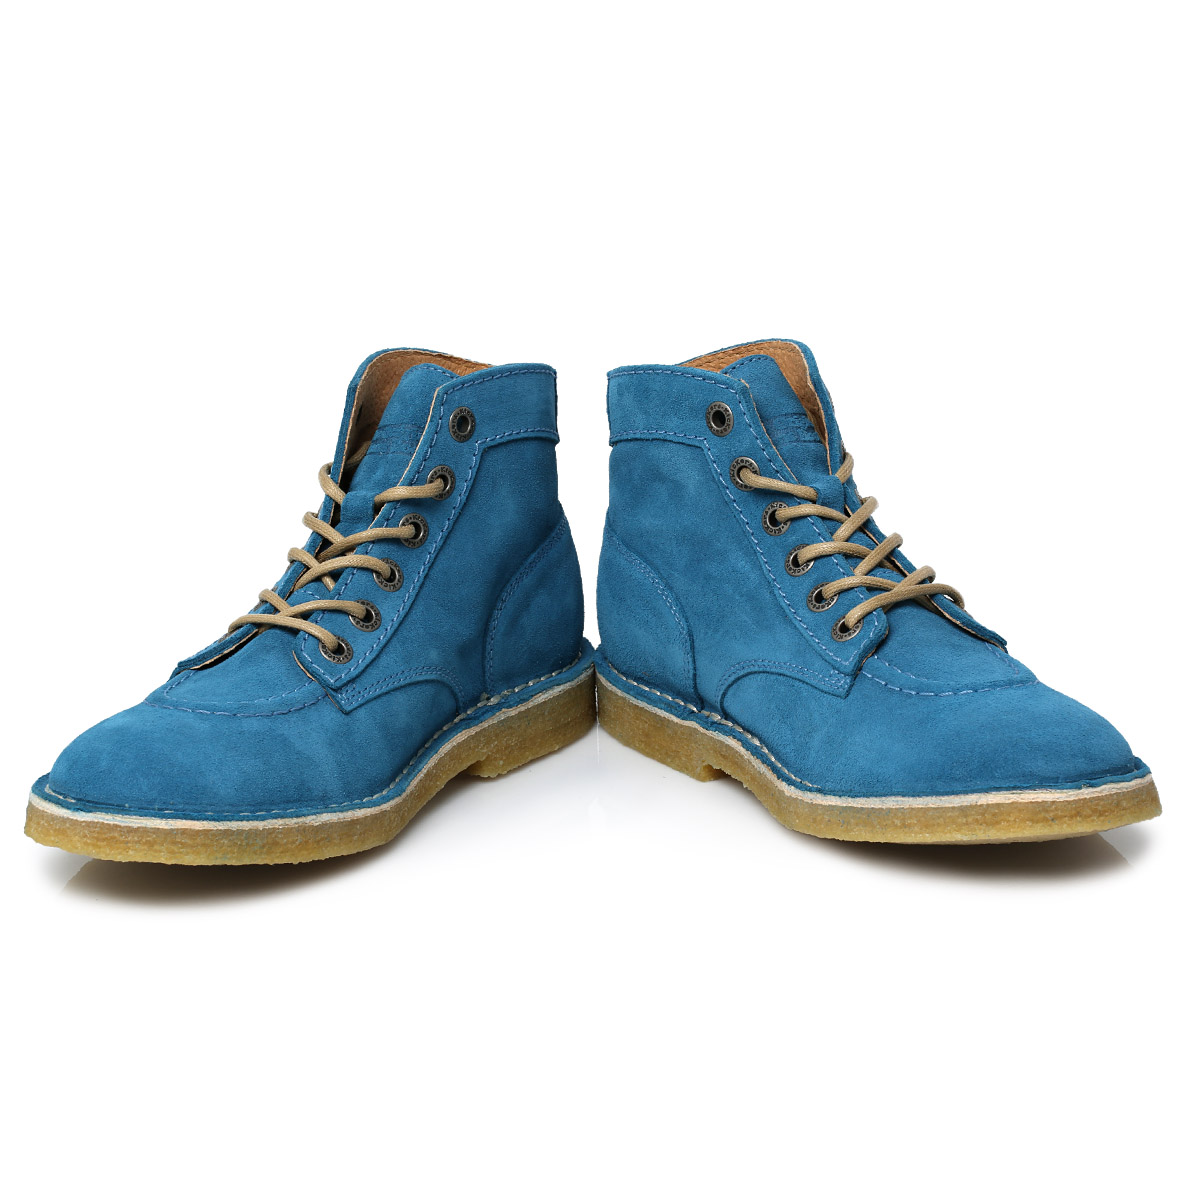 Kickers Blue Kick Legend Suede Mens Boots Size 7-11 | eBay